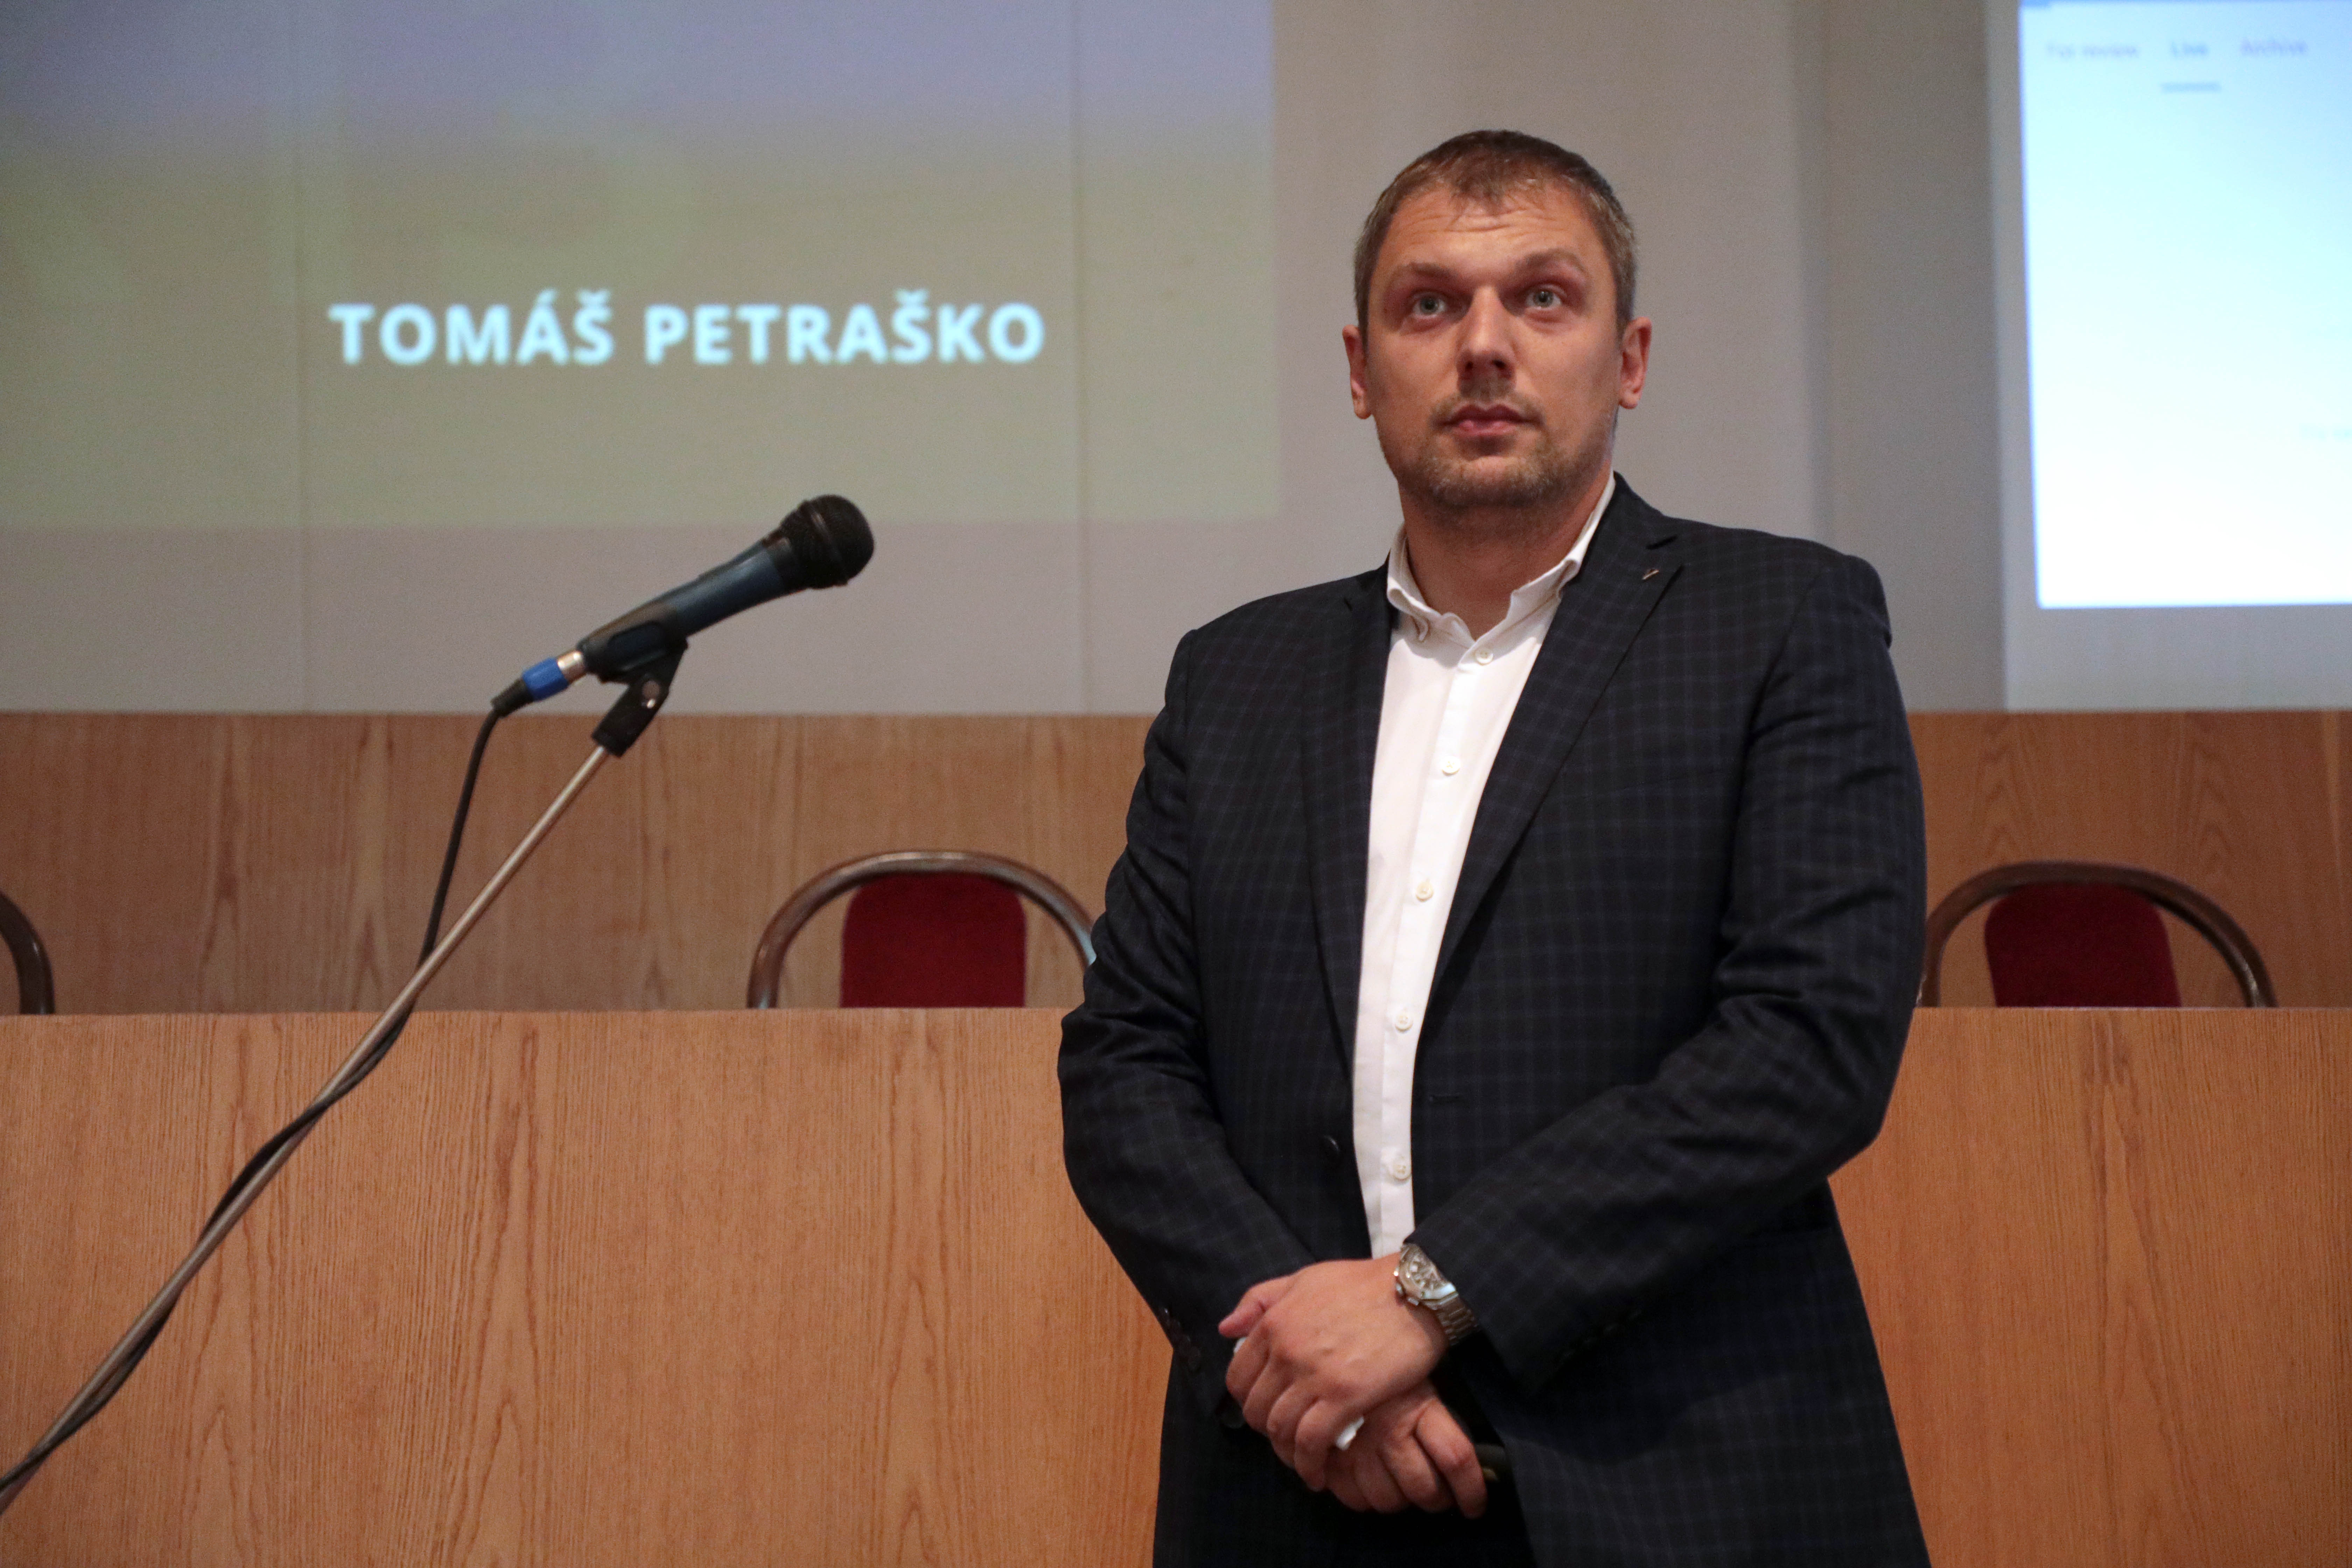 Tomáš Petraško